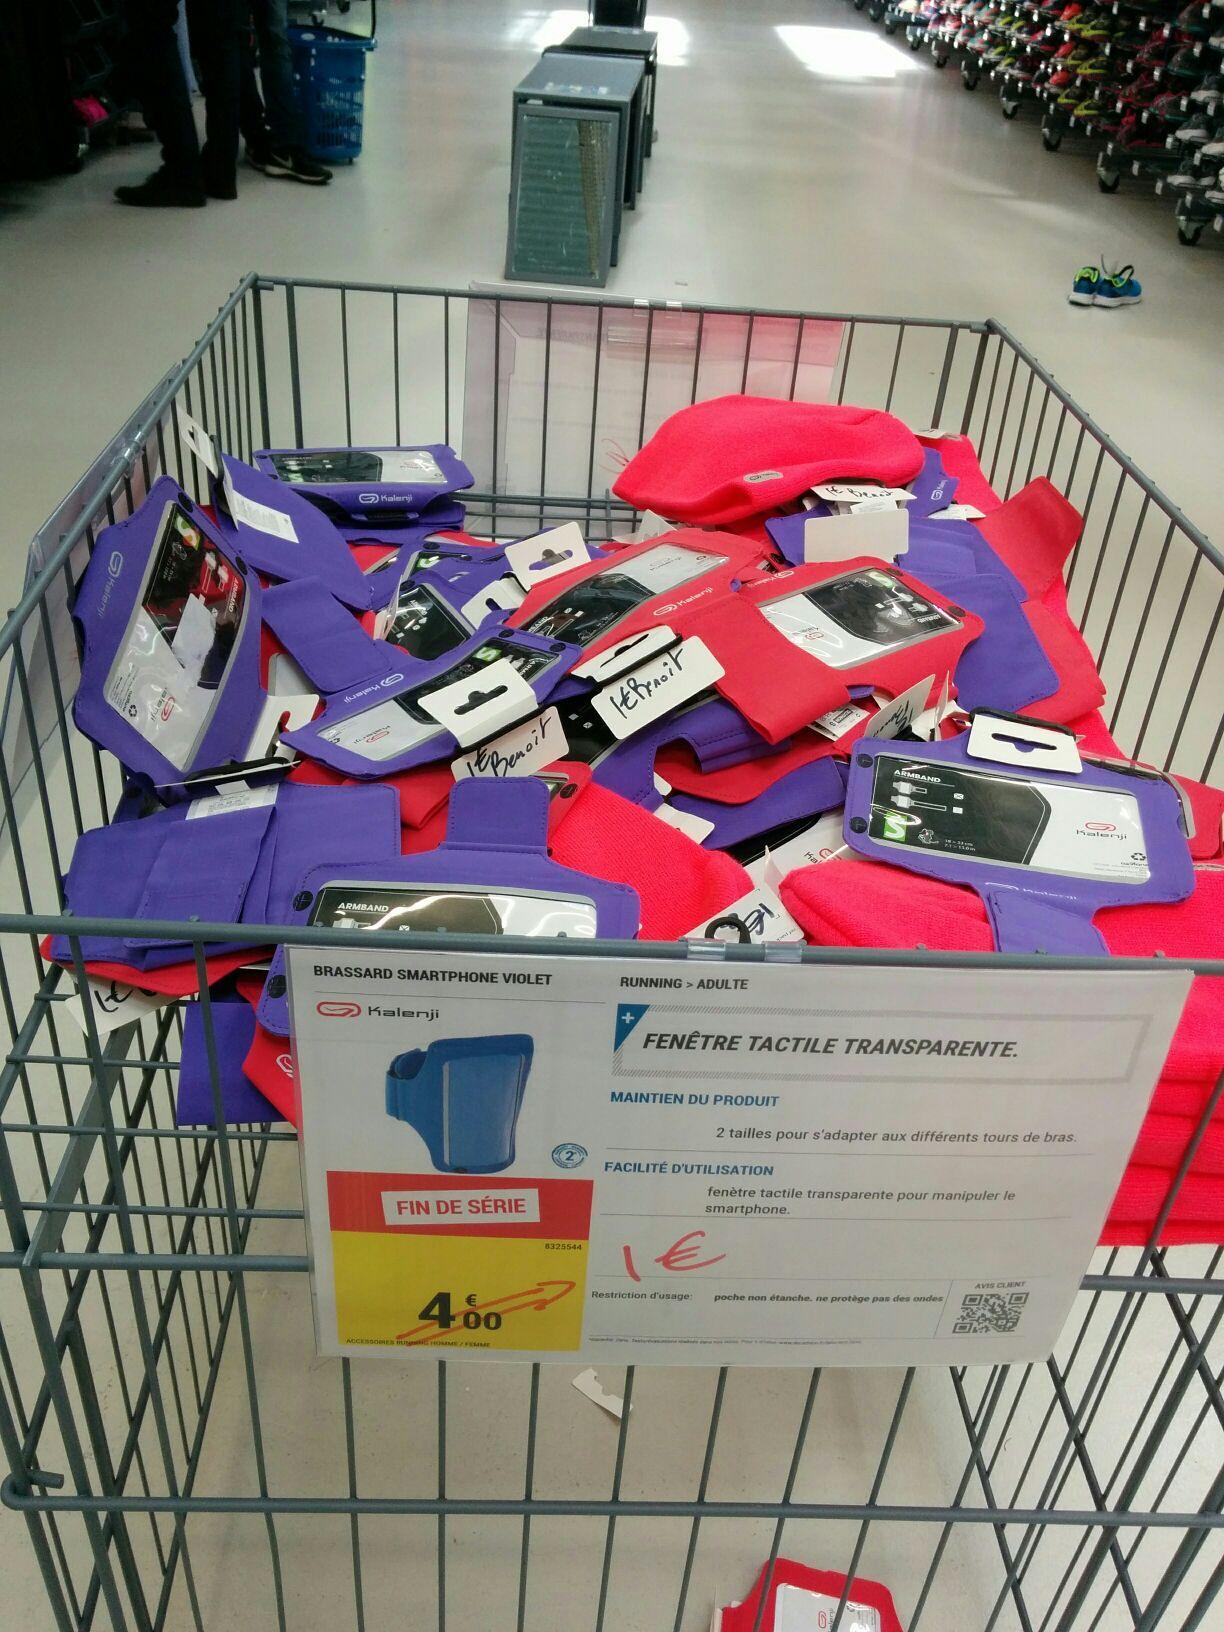 Brassard pour smartphone Kalenji - rose ou violet